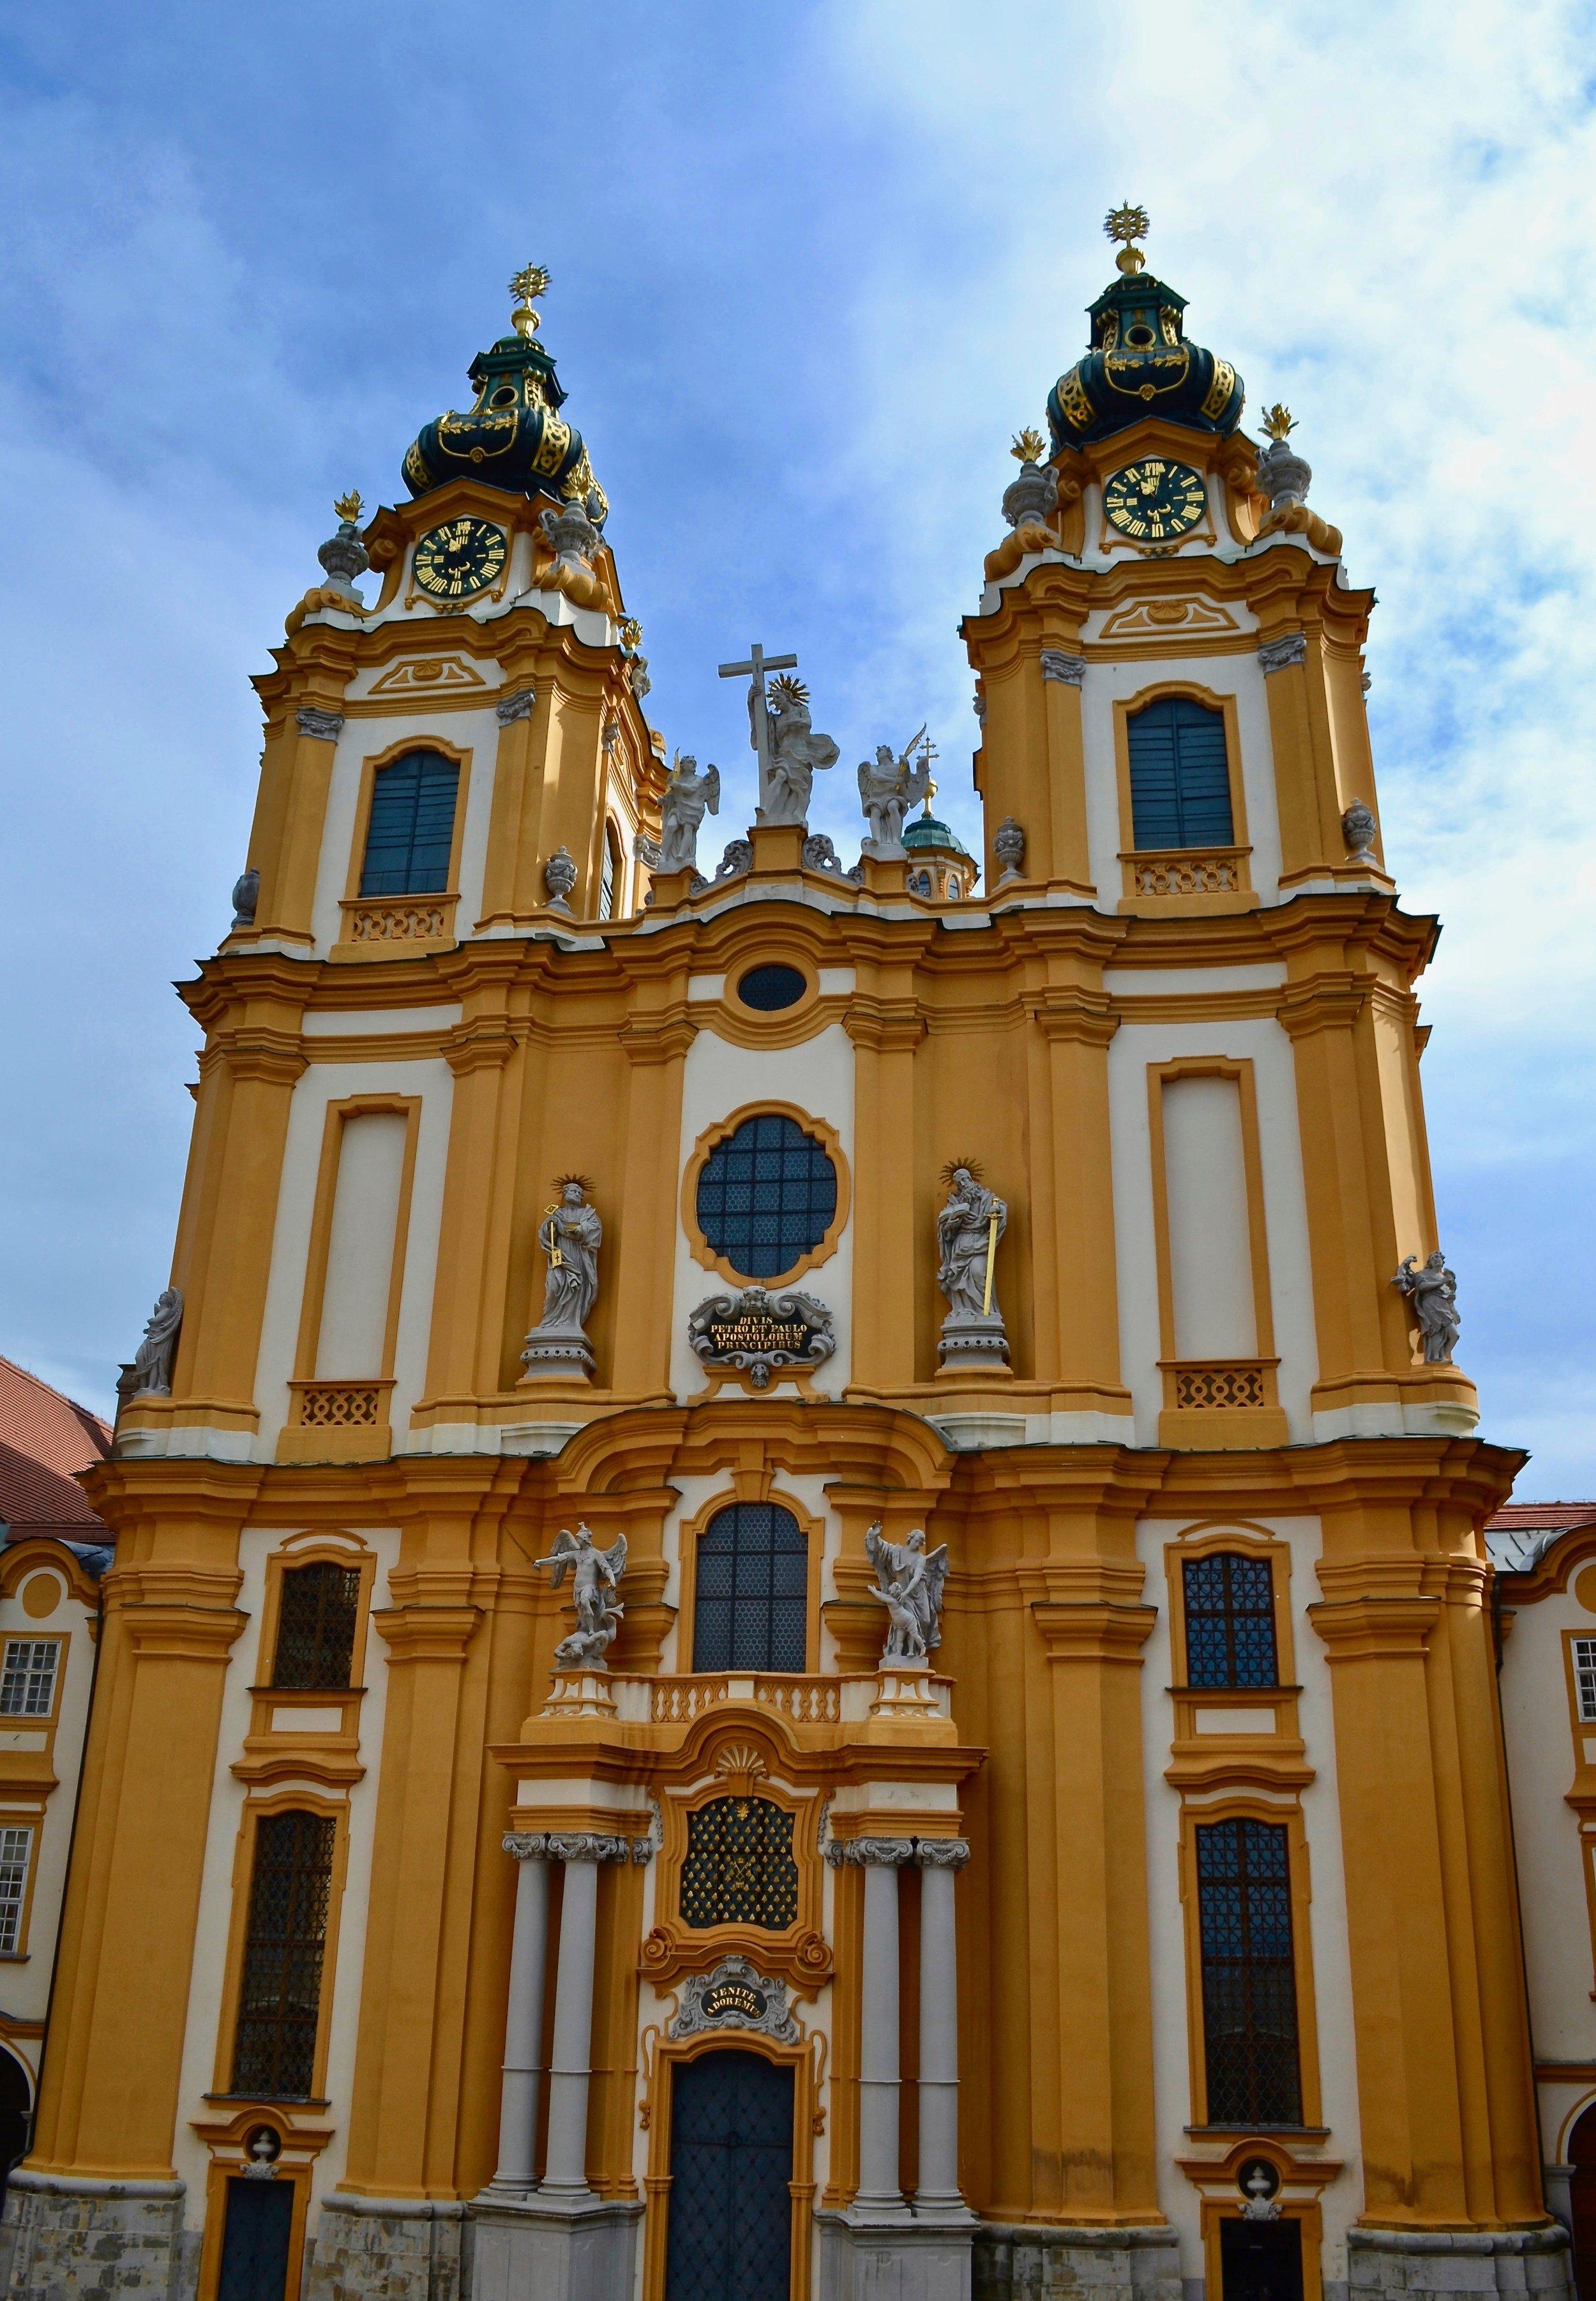 The Abbey Church of Melk Abbey